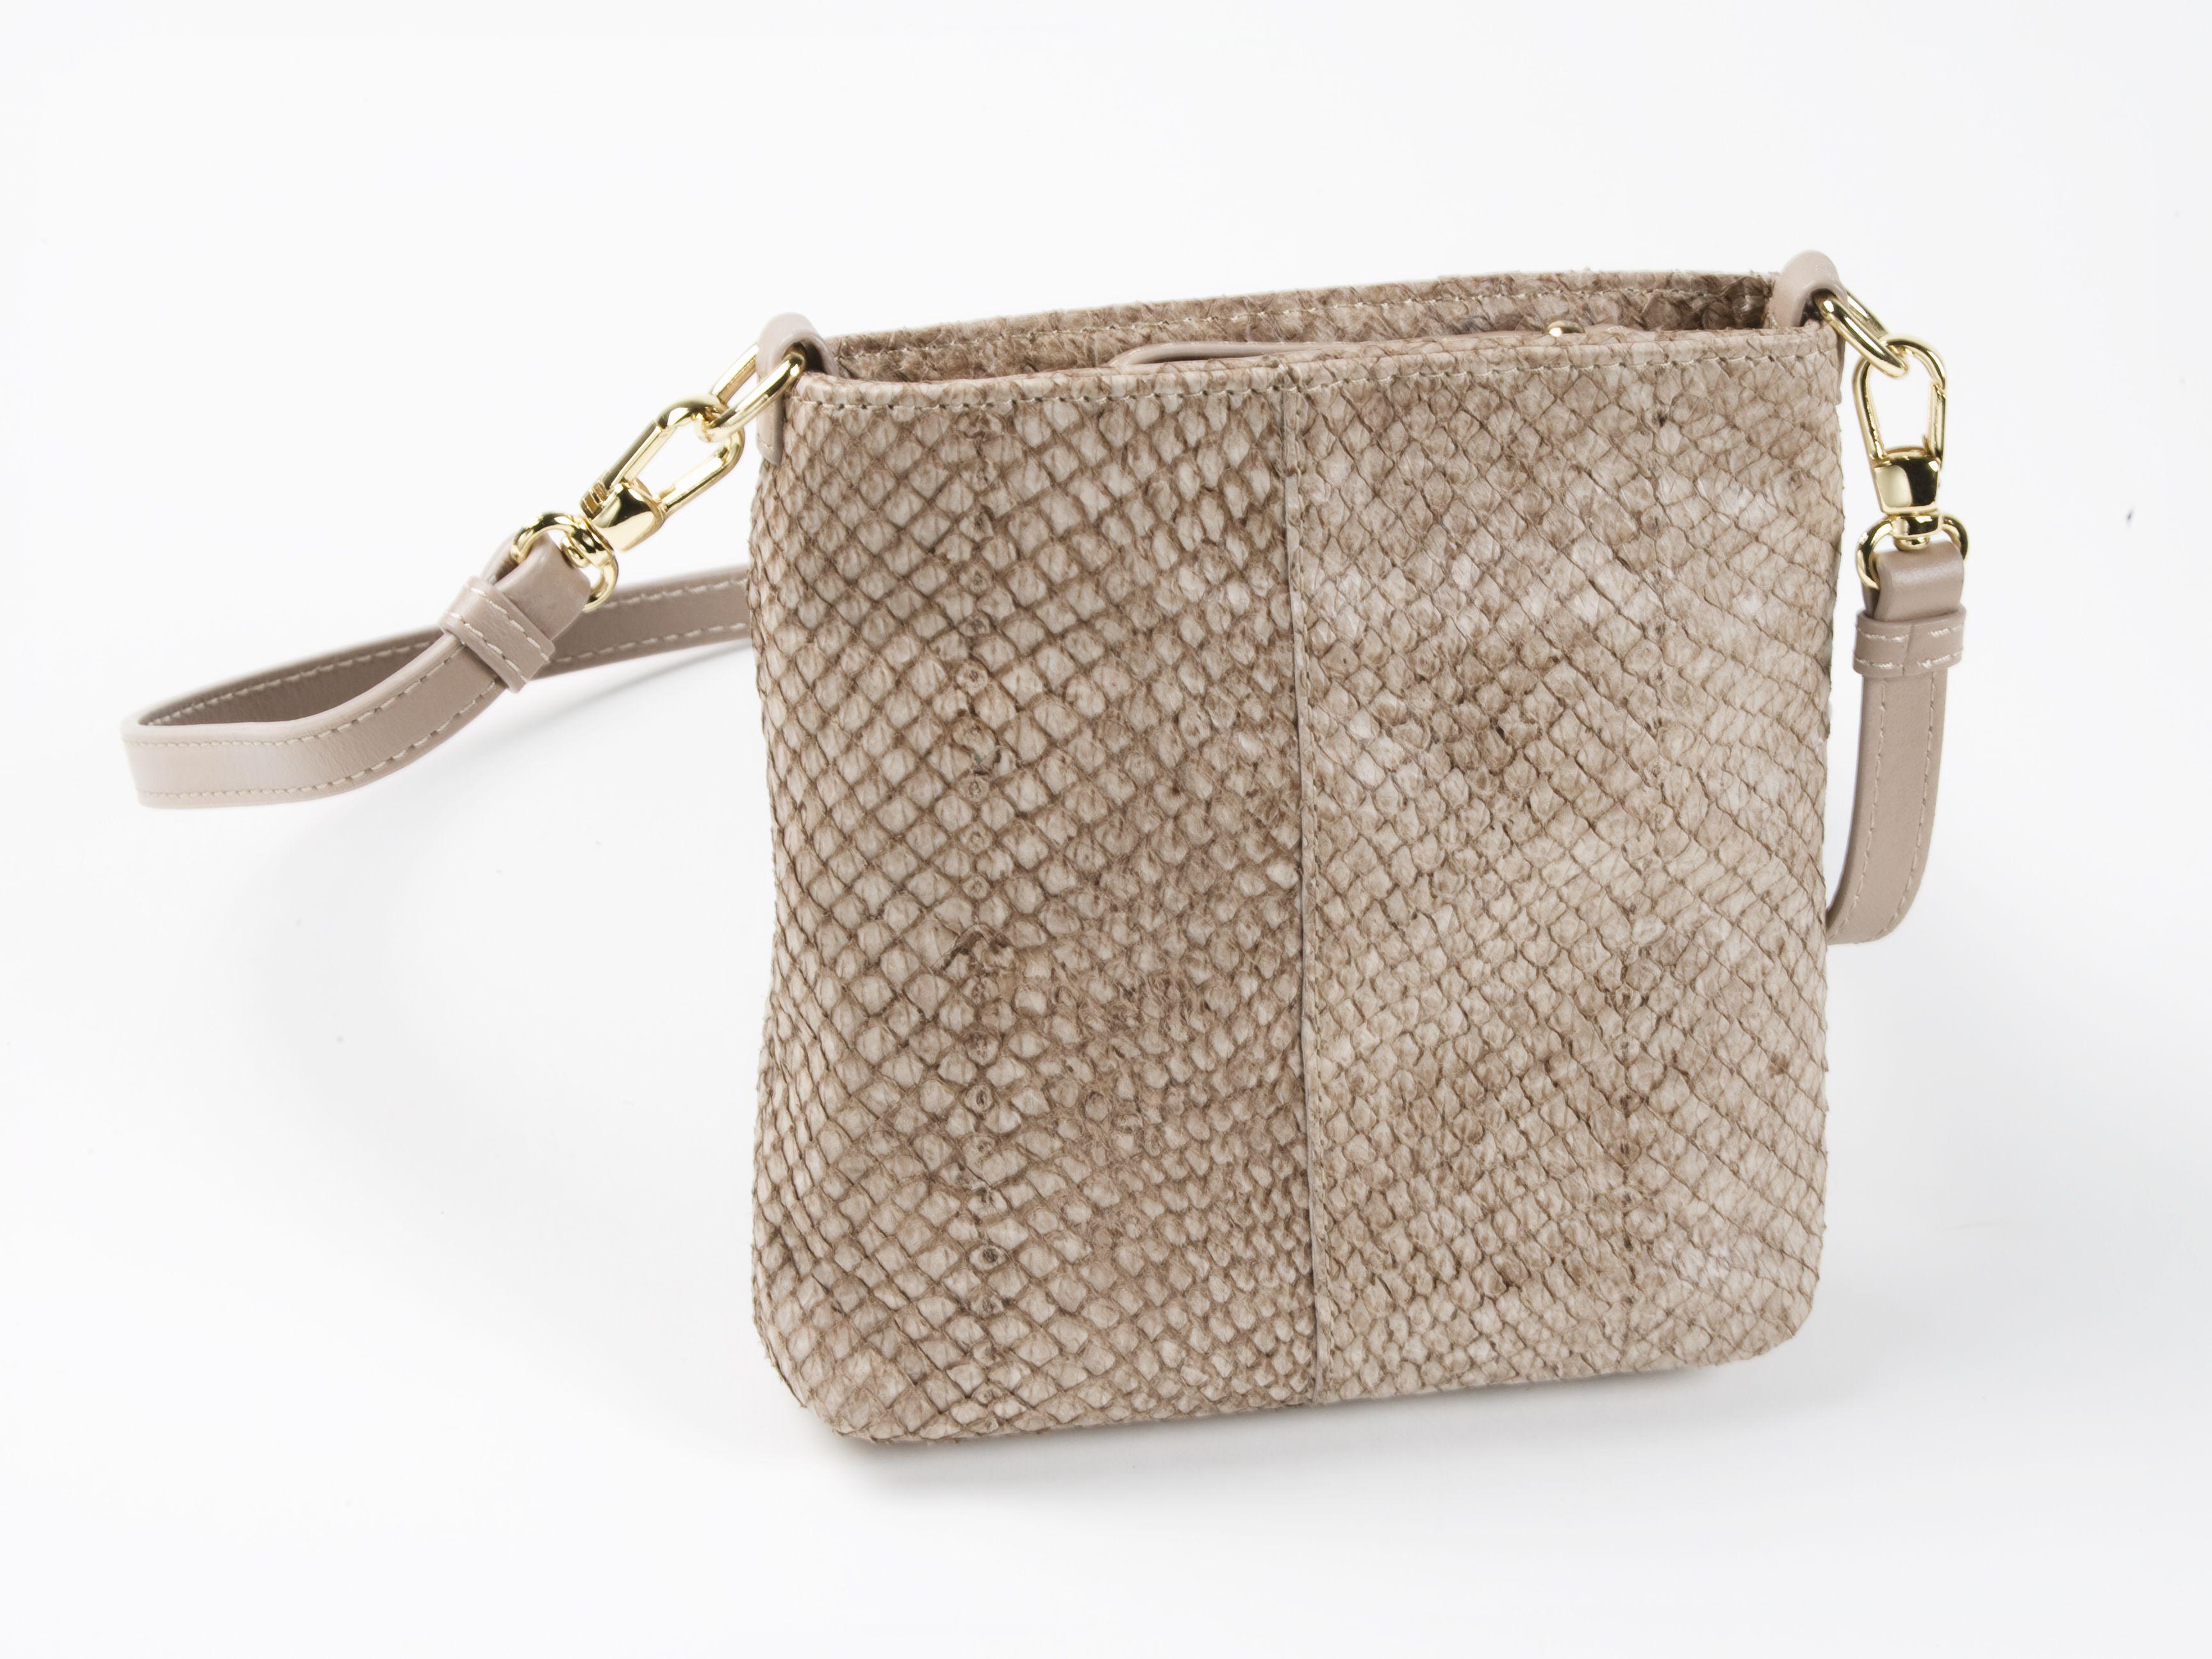 97606d25be8  handbag made of fish leather (salmon)